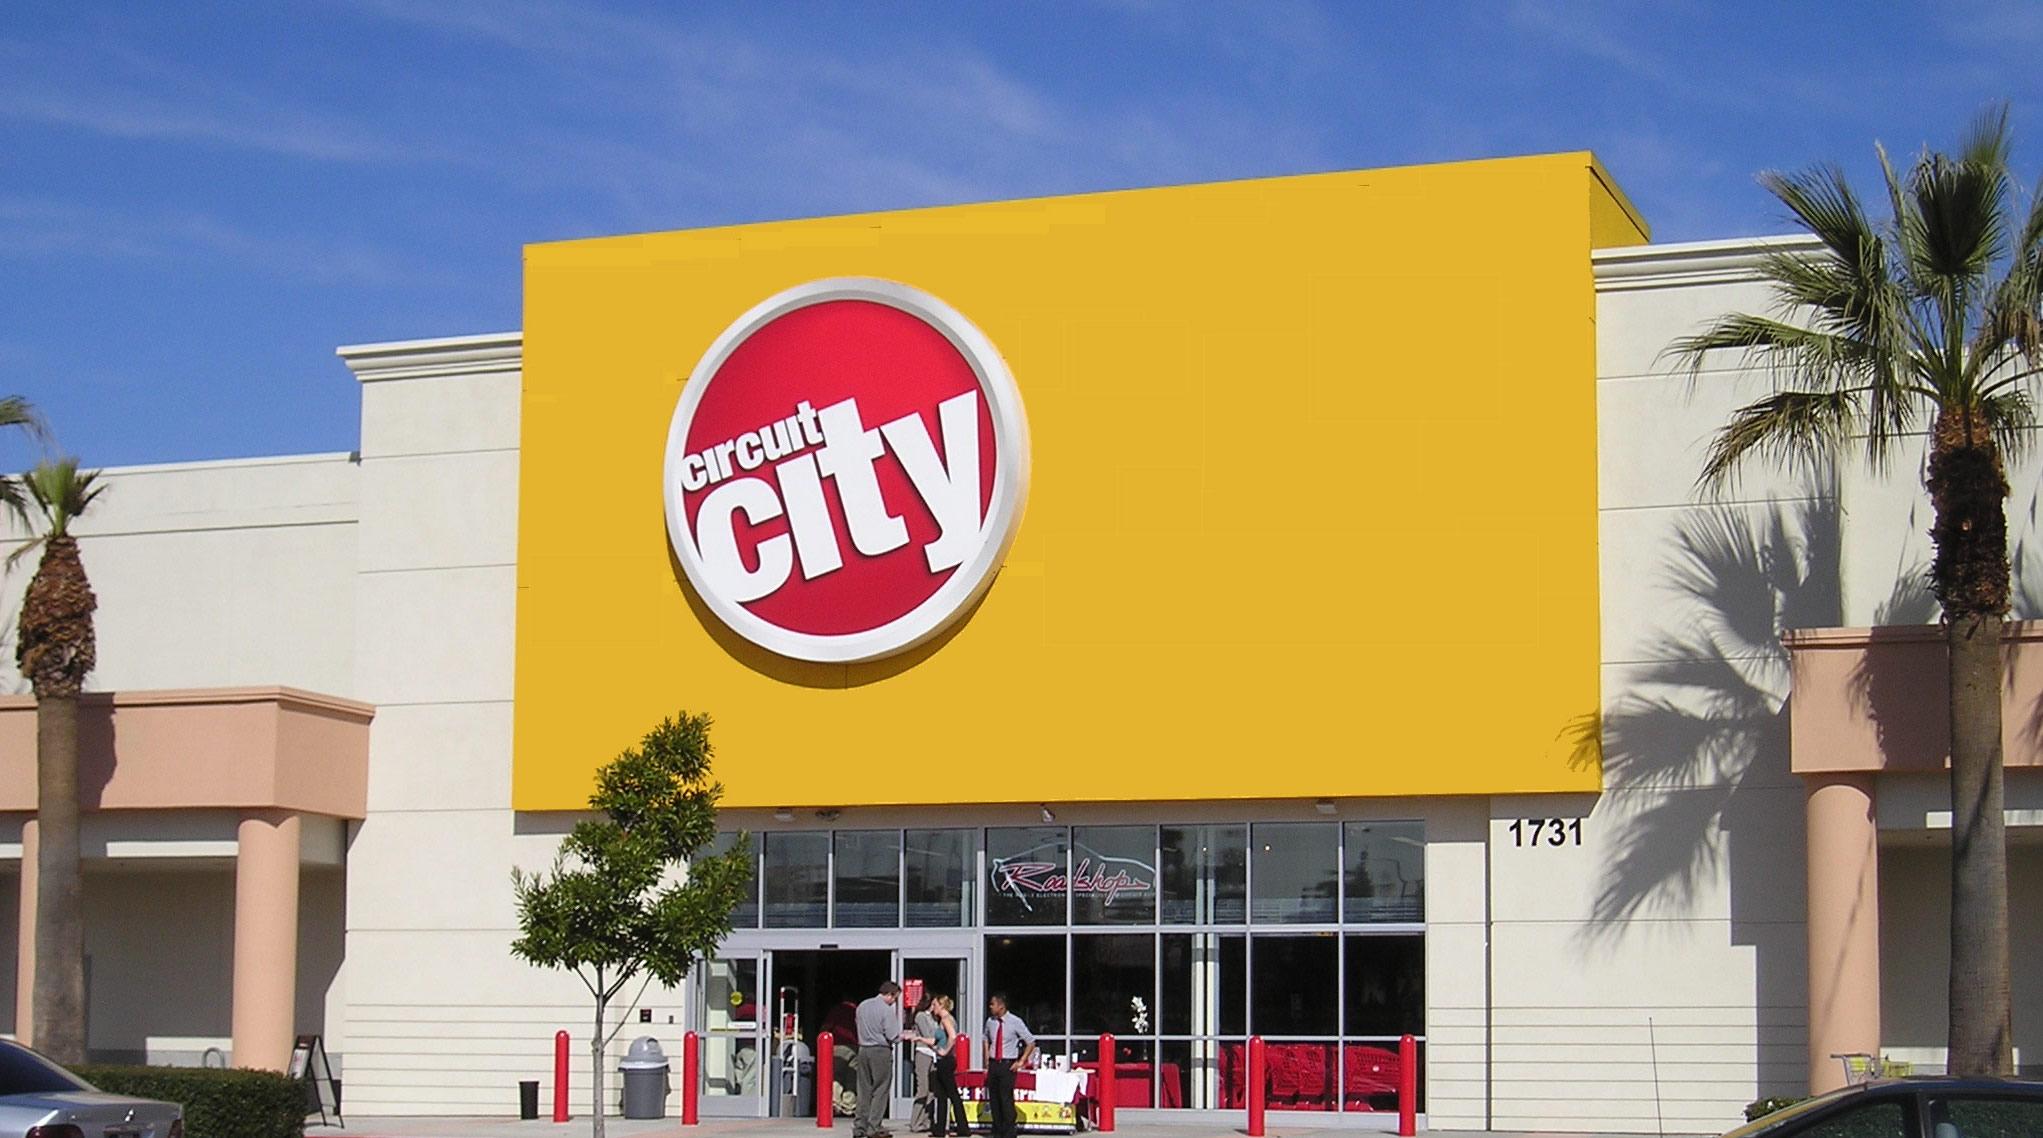 circuit-city-jpeg-p10100032